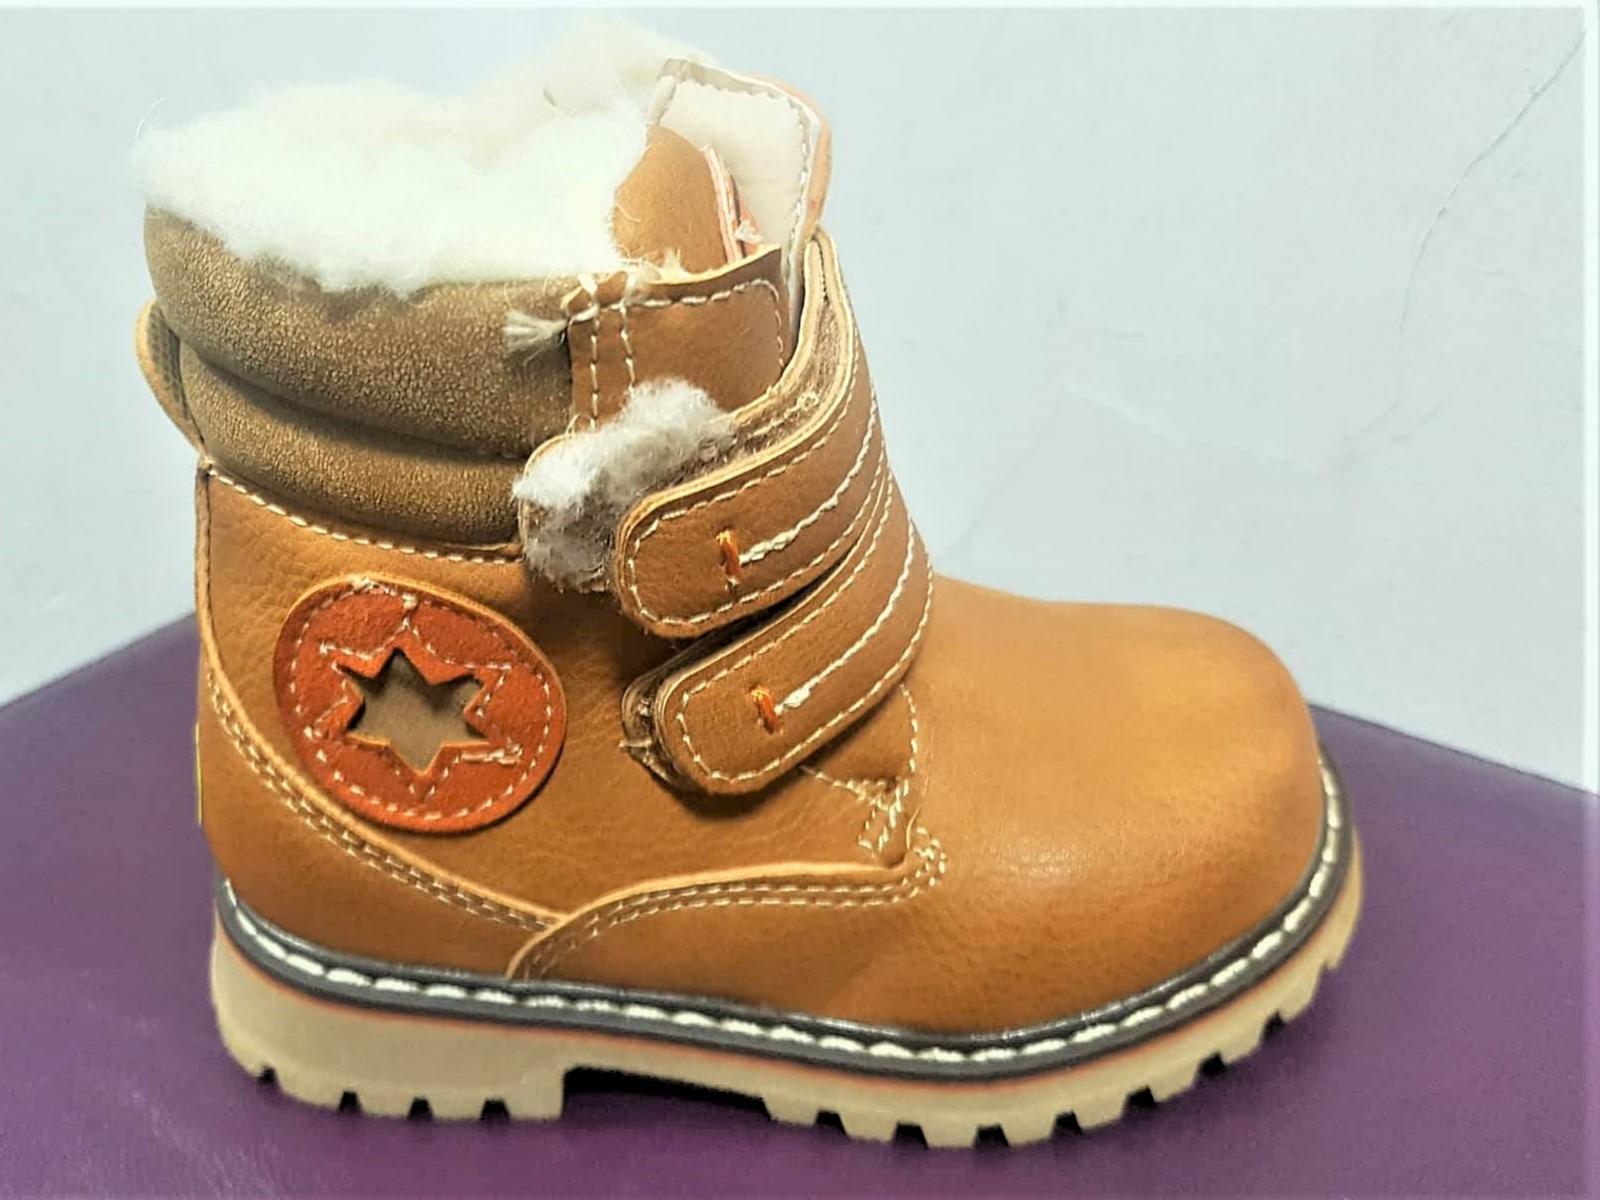 amazon magazin din Marea Britanie pantofi casual Ghete blanite KAKI cu blana de baieti marimi 21-25, inchidere cu ...